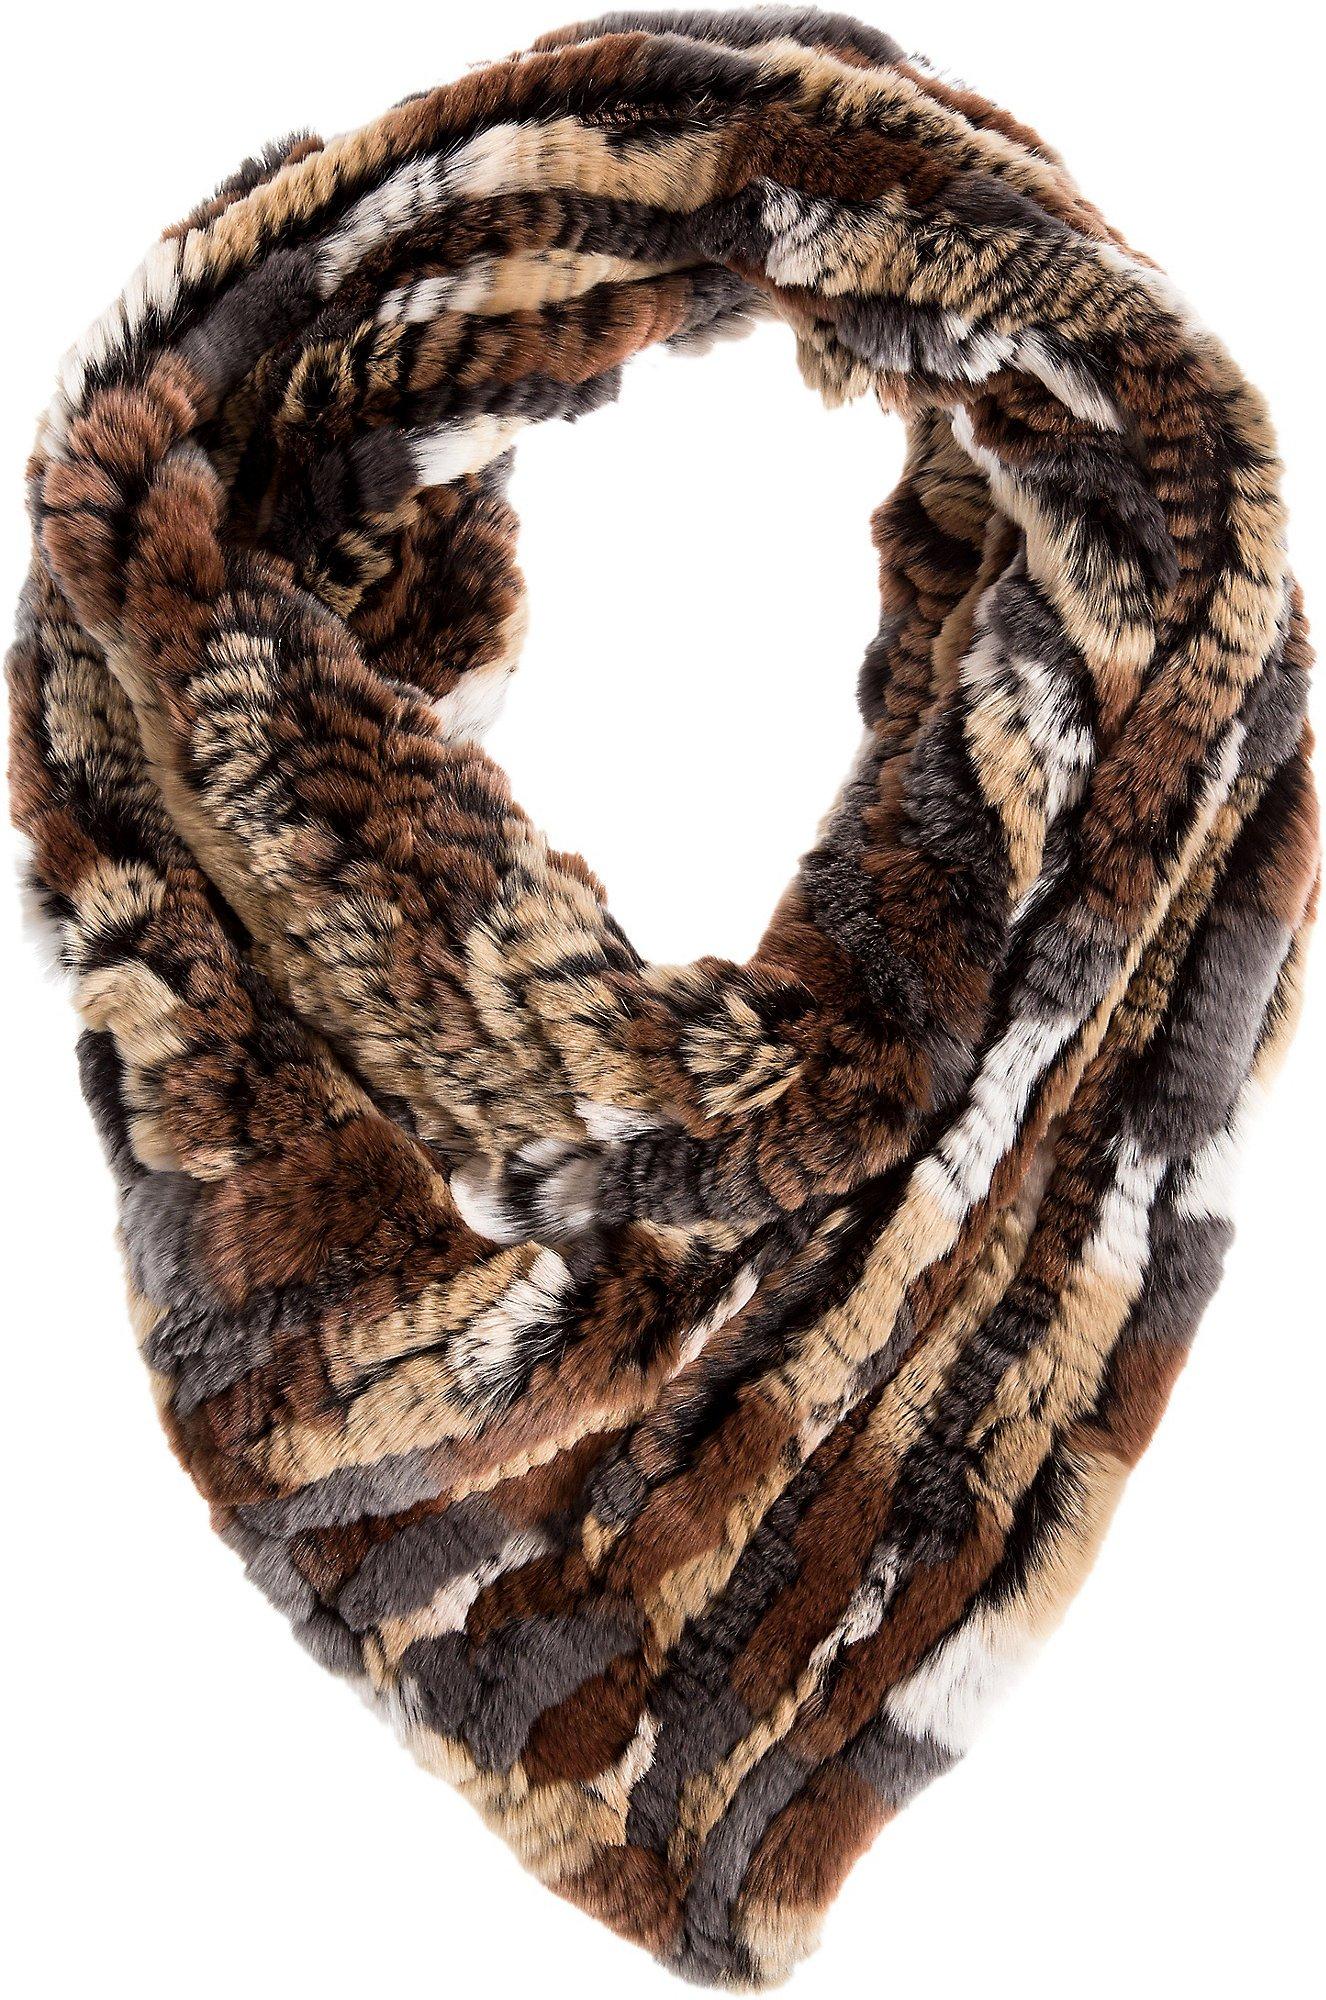 Knitted Rex Rabbit Fur Stretch Tube Scarf